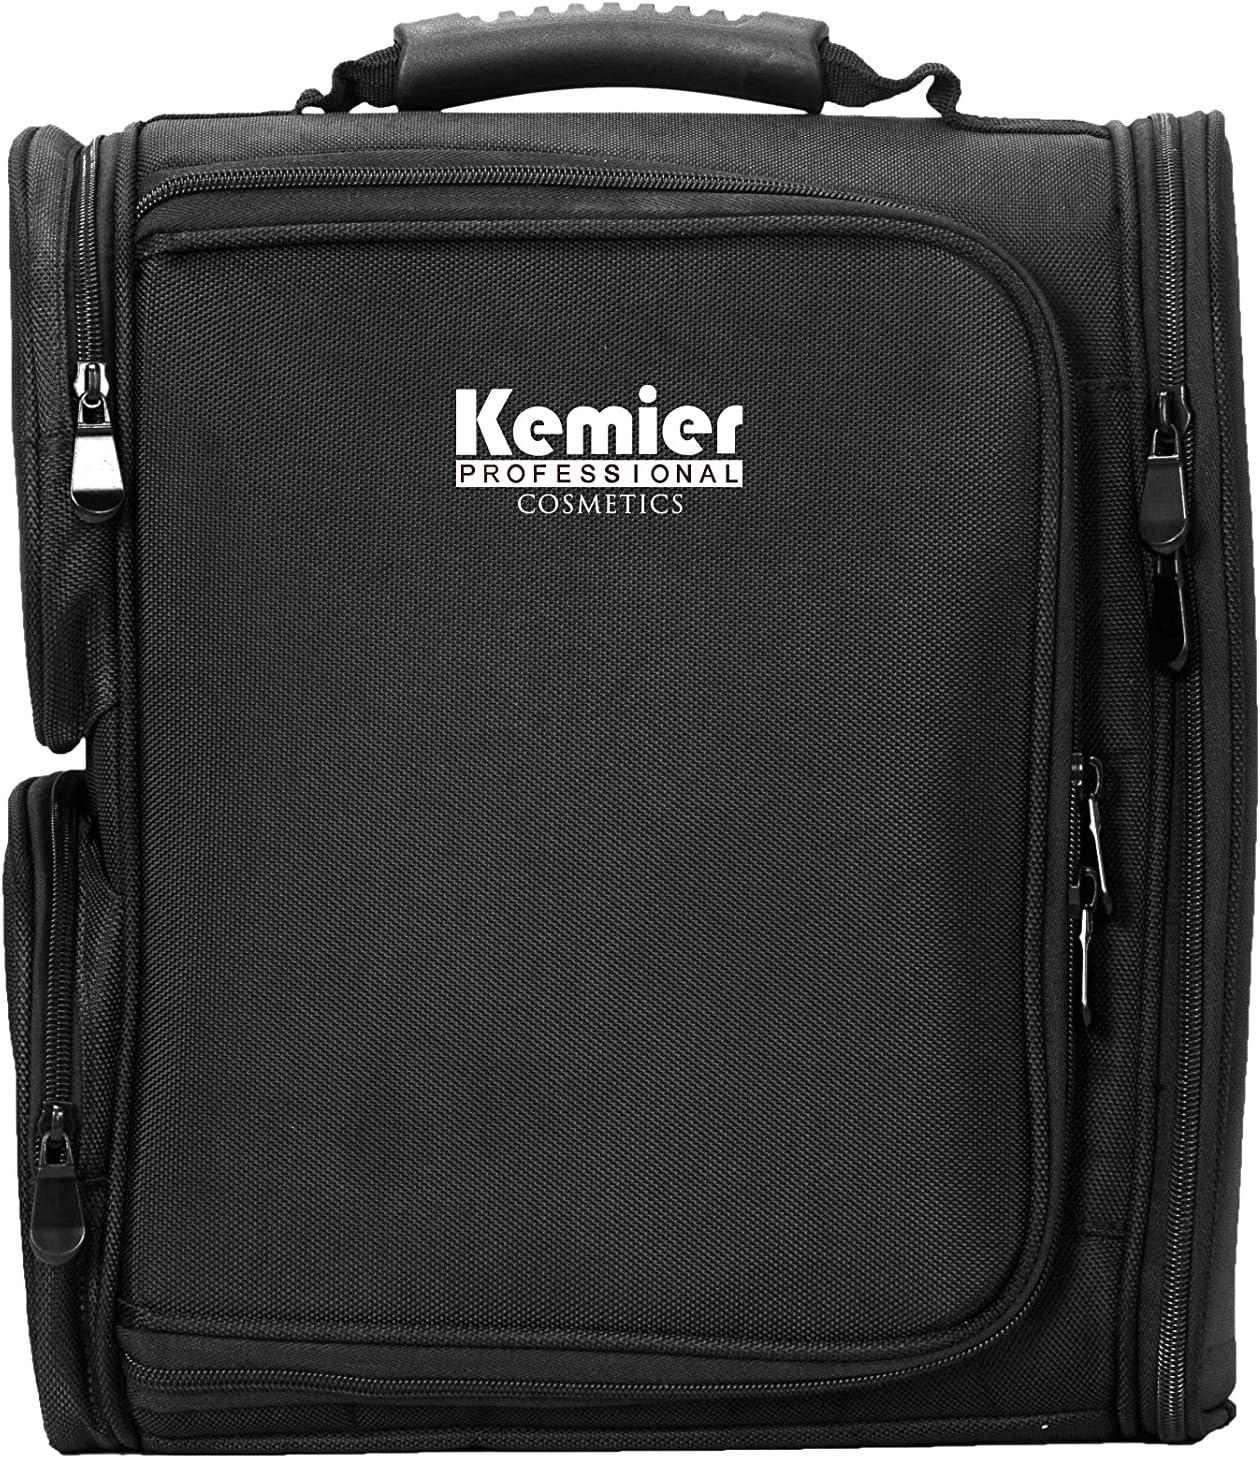 Kemier Professional Makeup Artist - Mochila con bolsas de almacenamiento transparentes para cosméticos, bolsa con forro térmico, color negro